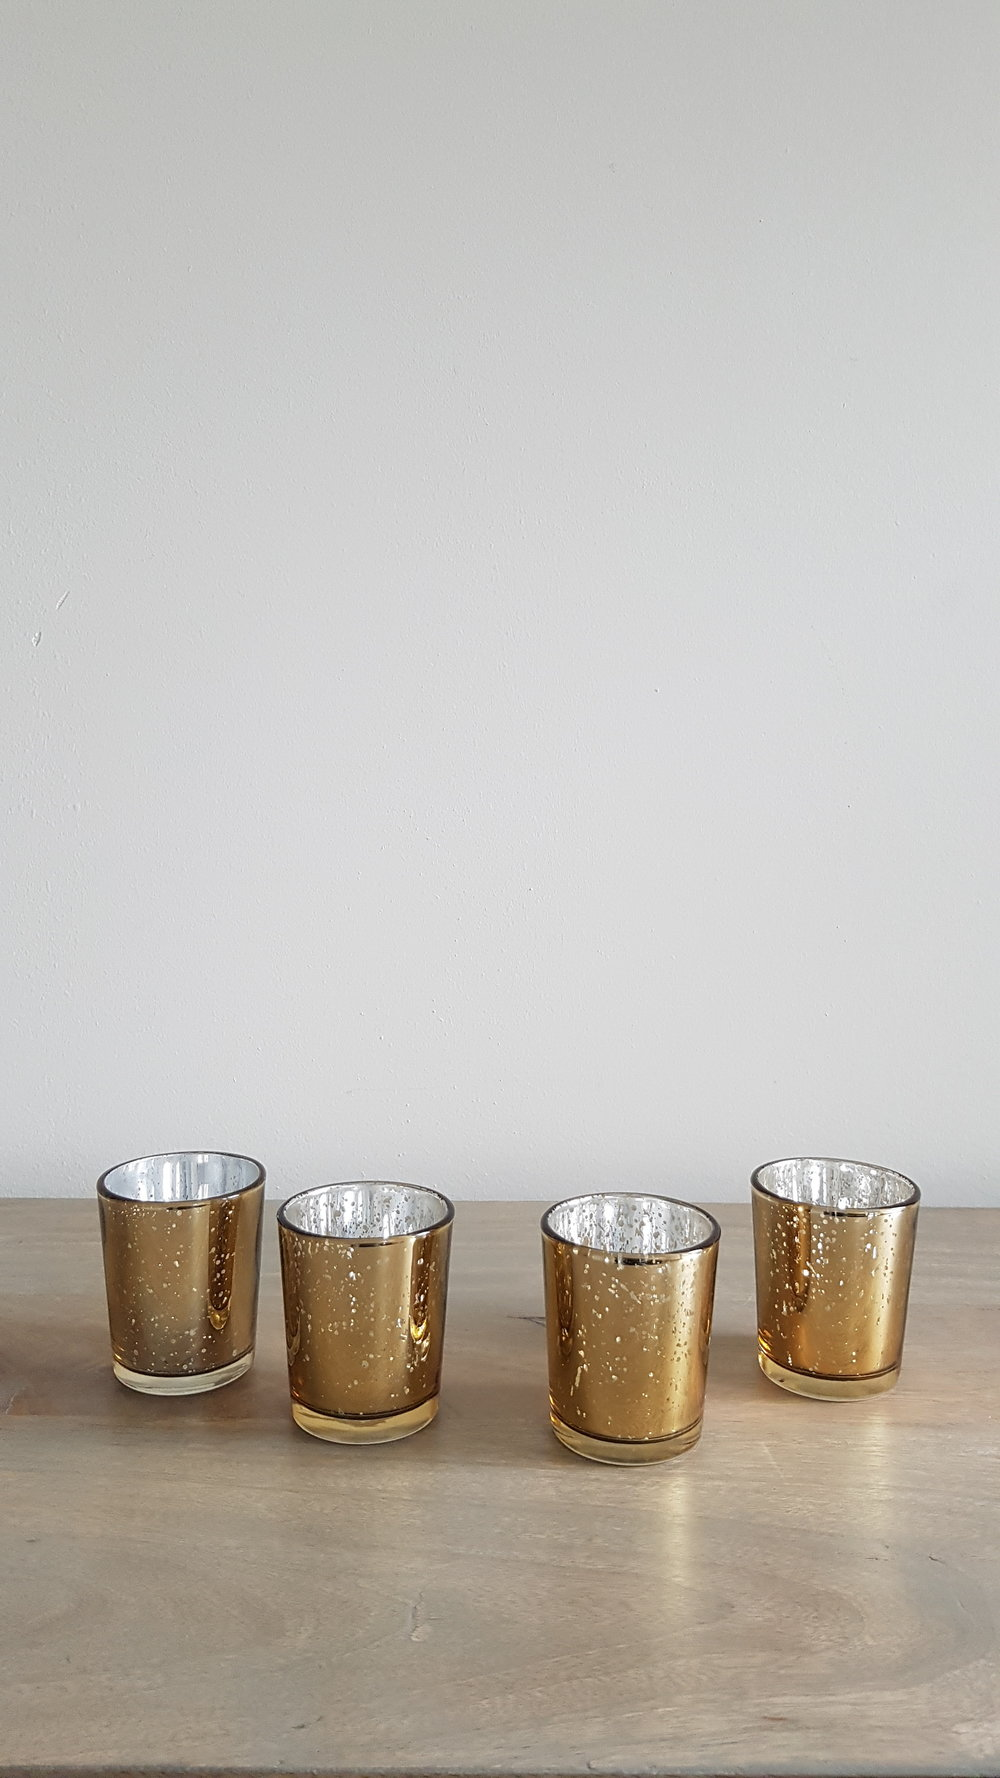 Gold Mercury Glass Votive Candleholder - $2 each   Qty: 100  .